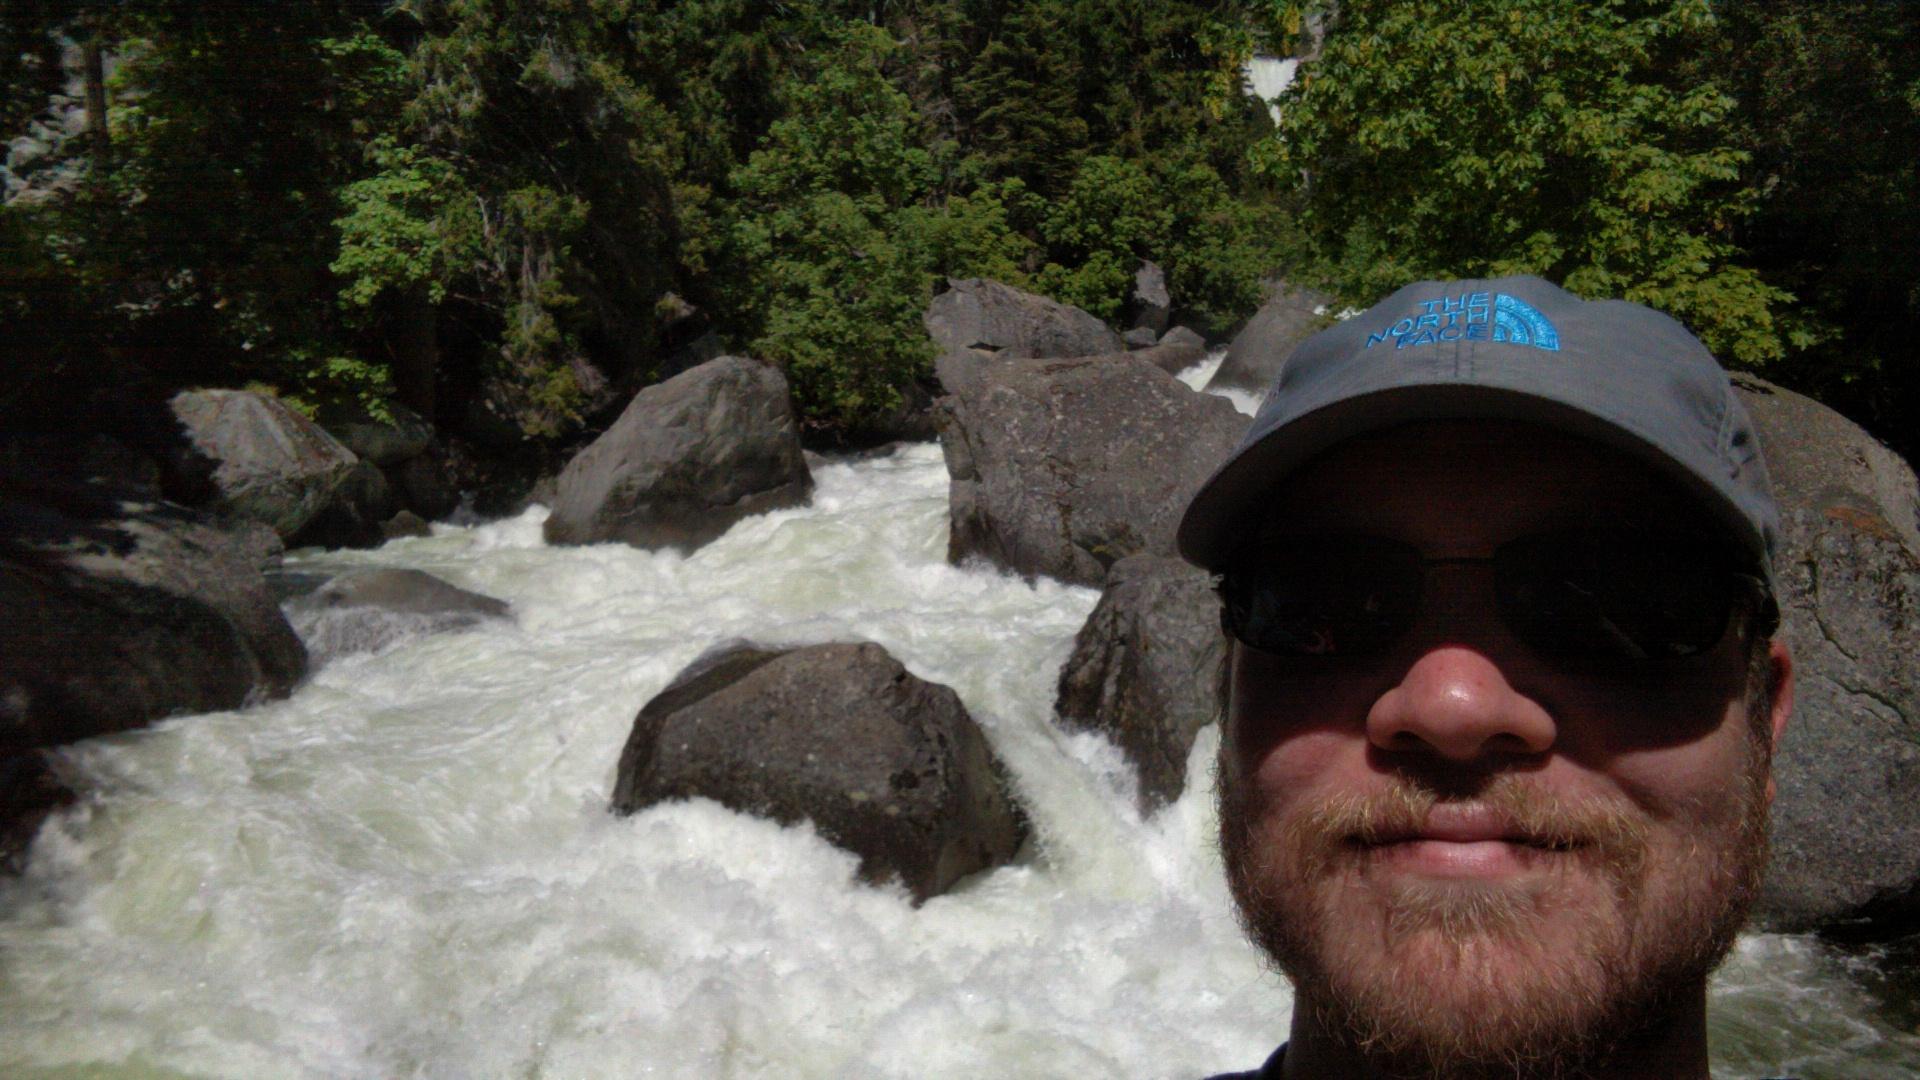 A waterfall or something in Yosemite.